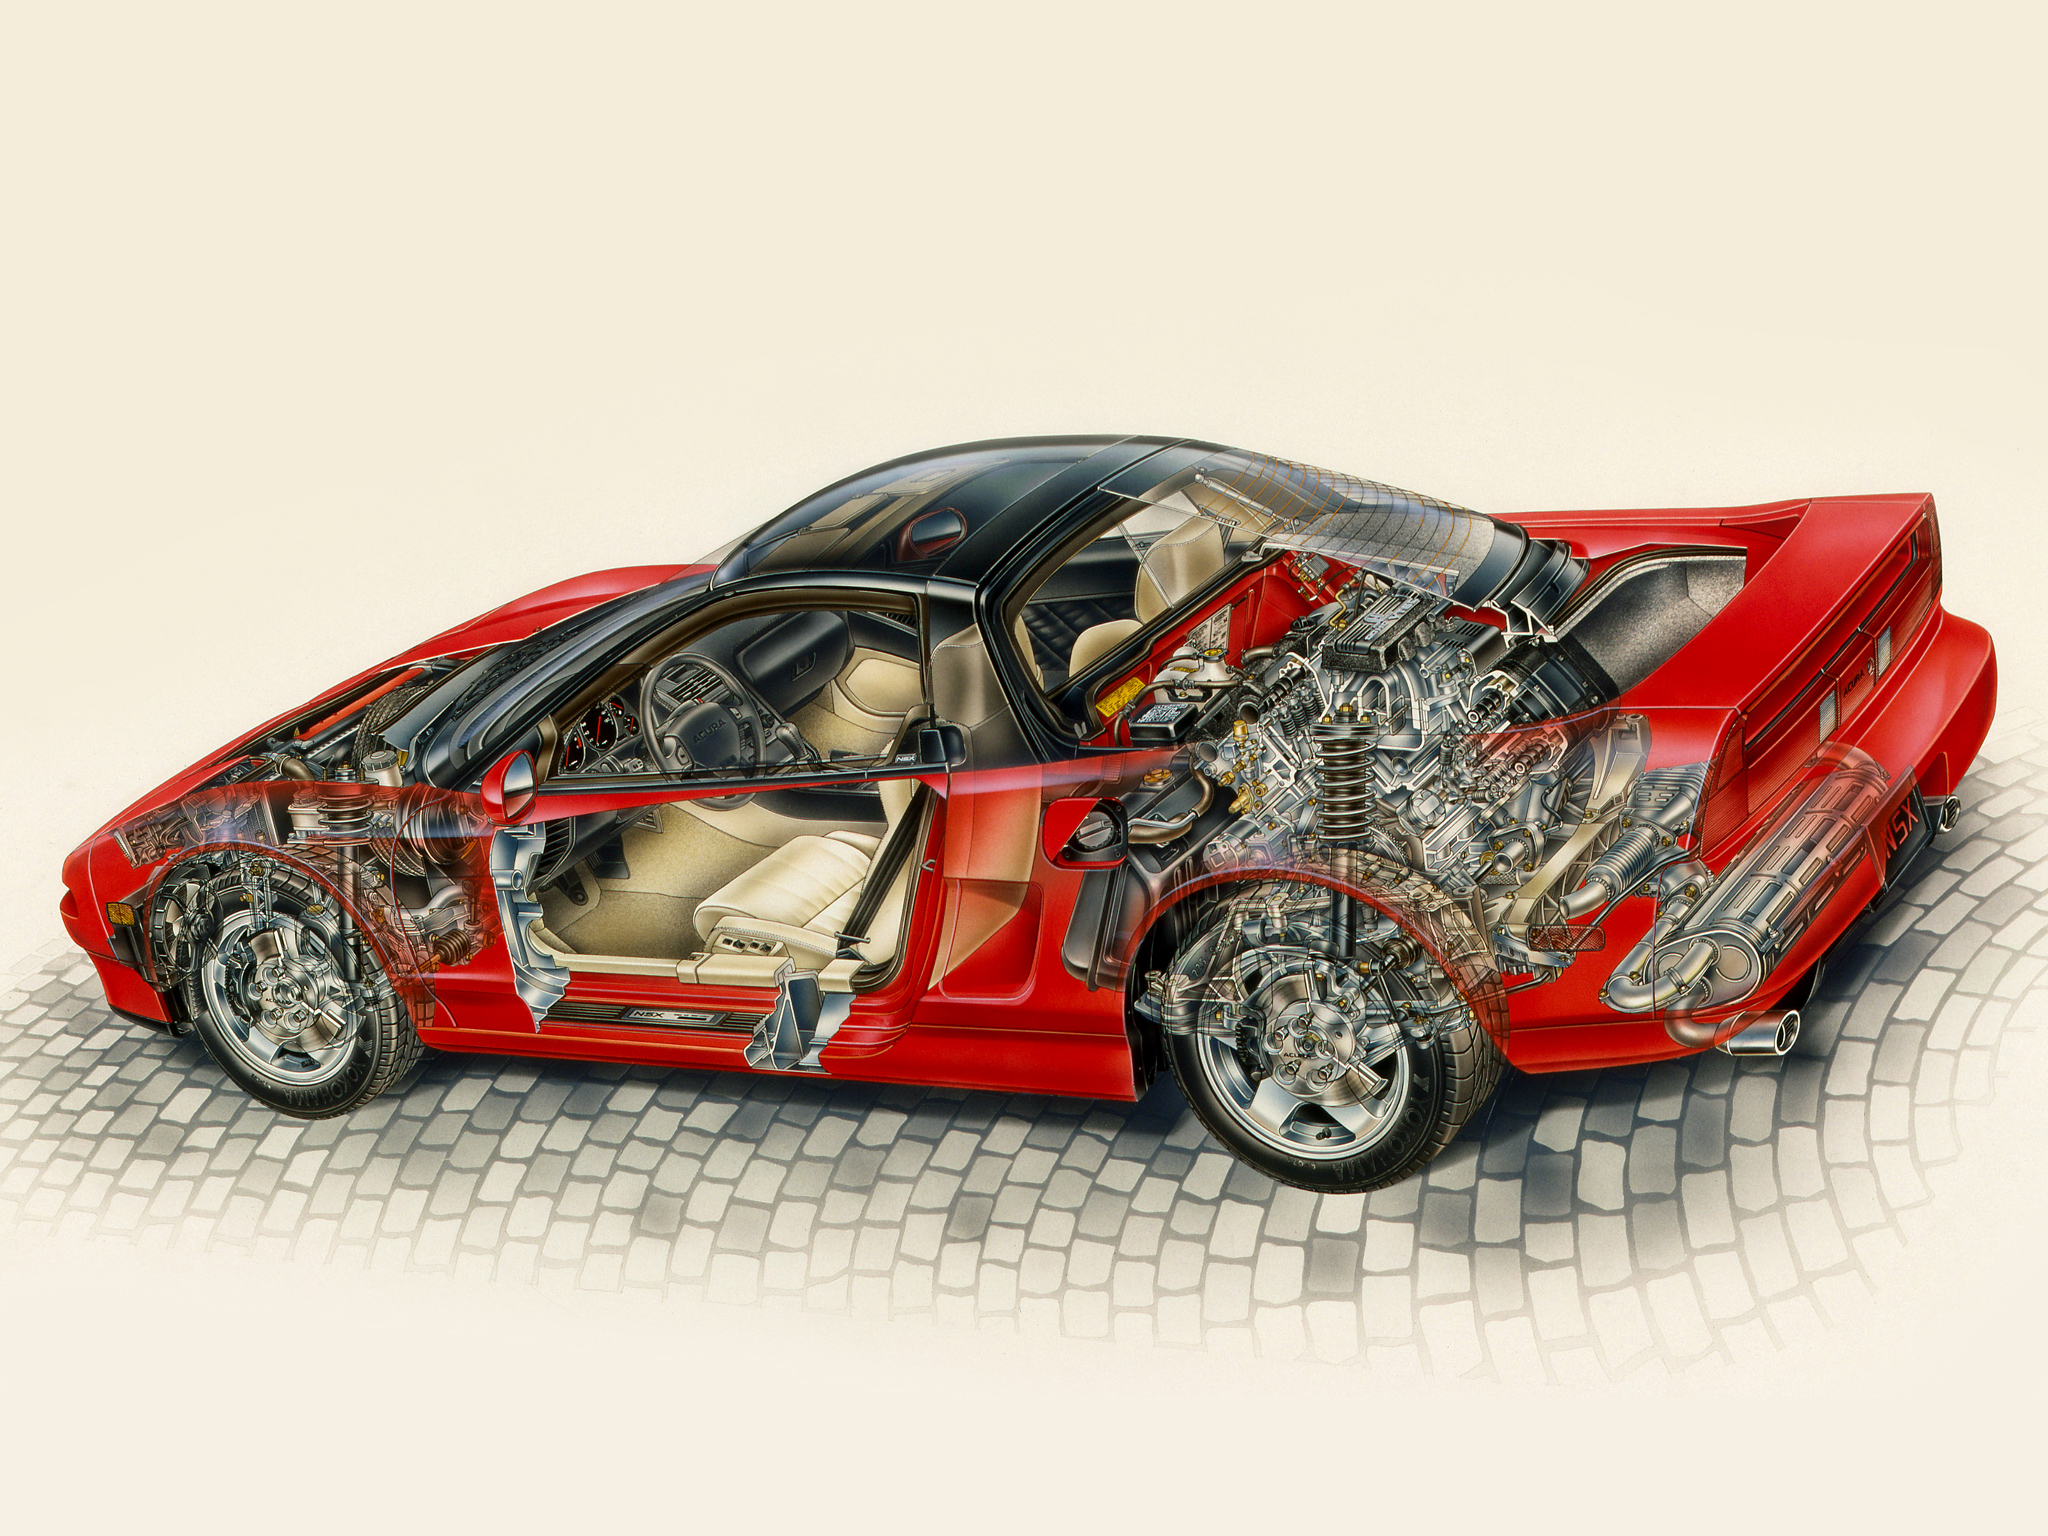 1991 acura nsx supercar supercars interior engine engines 1991 acura nsx supercar supercars interior engine engines wallpaper 2048x1536 116141 wallpaperup voltagebd Gallery